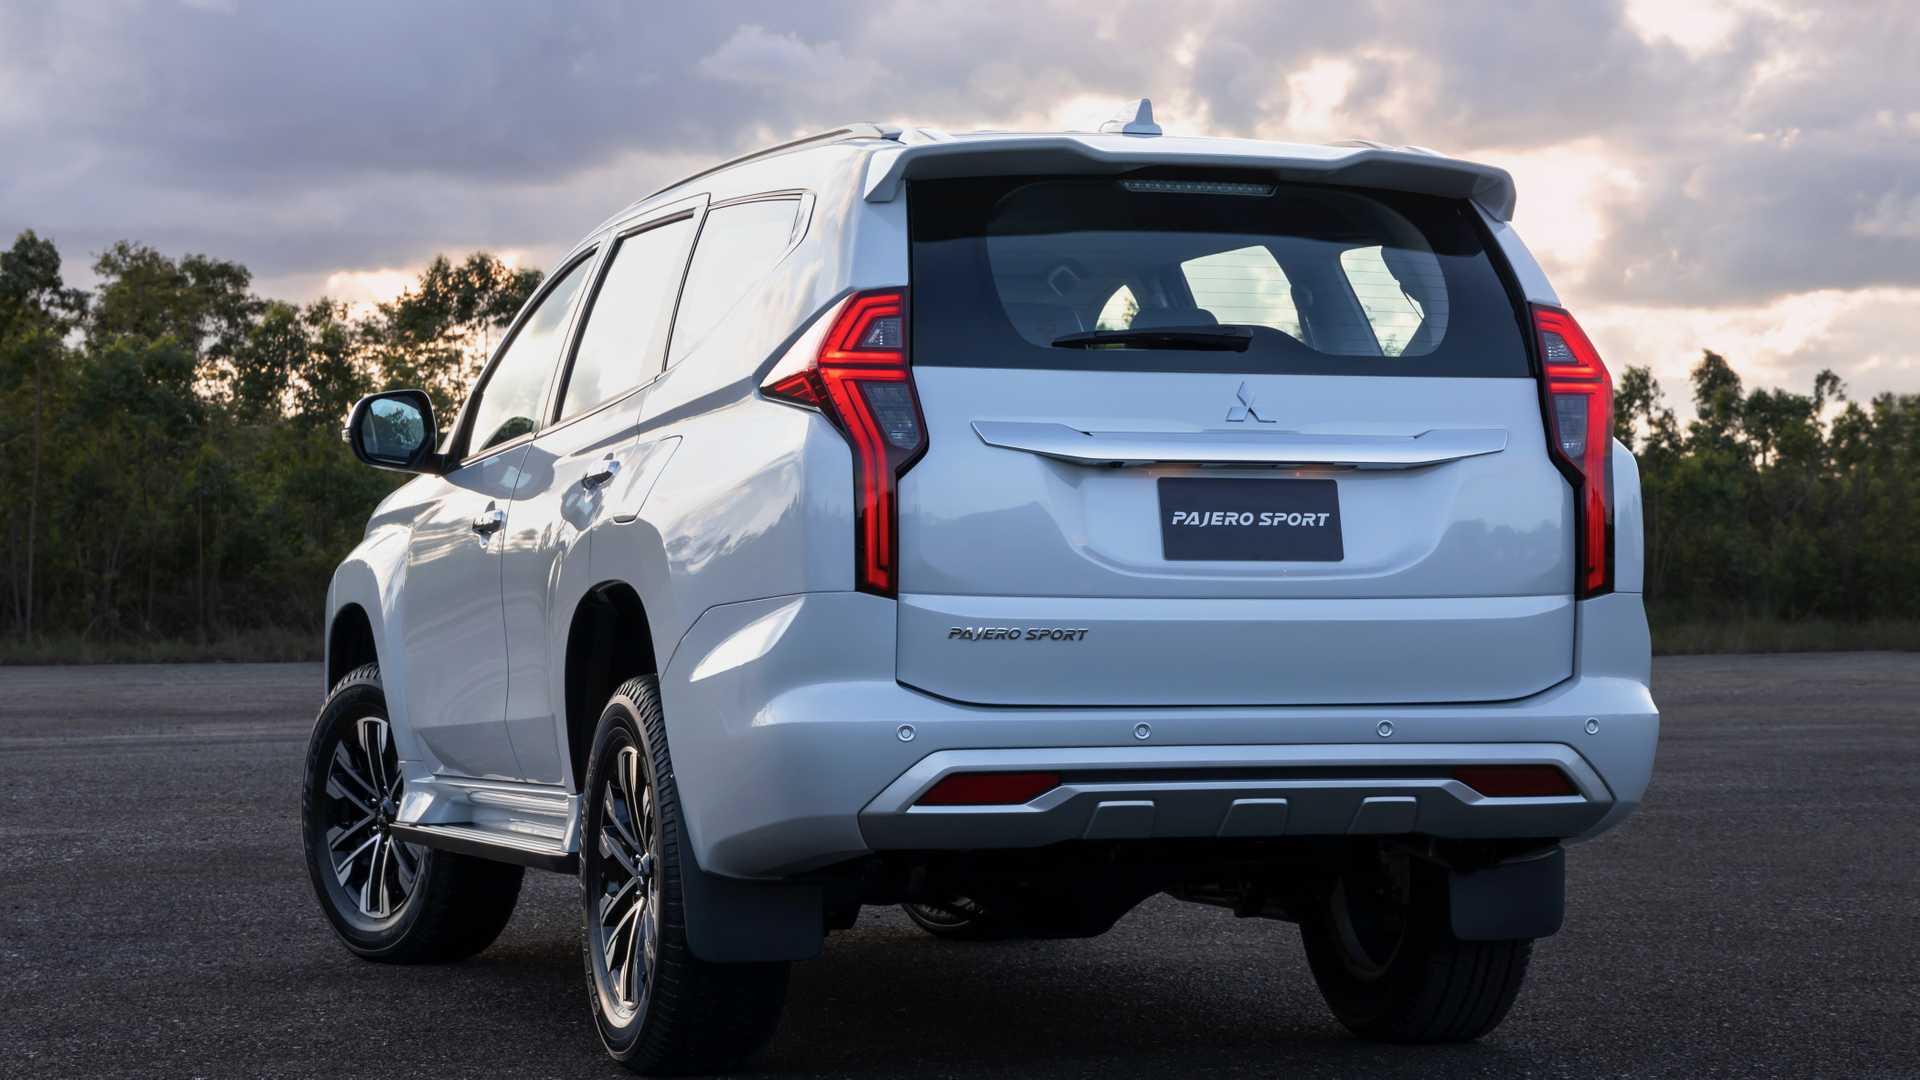 2020_Mitsubishi_Pajero_Sport_facelift_0019